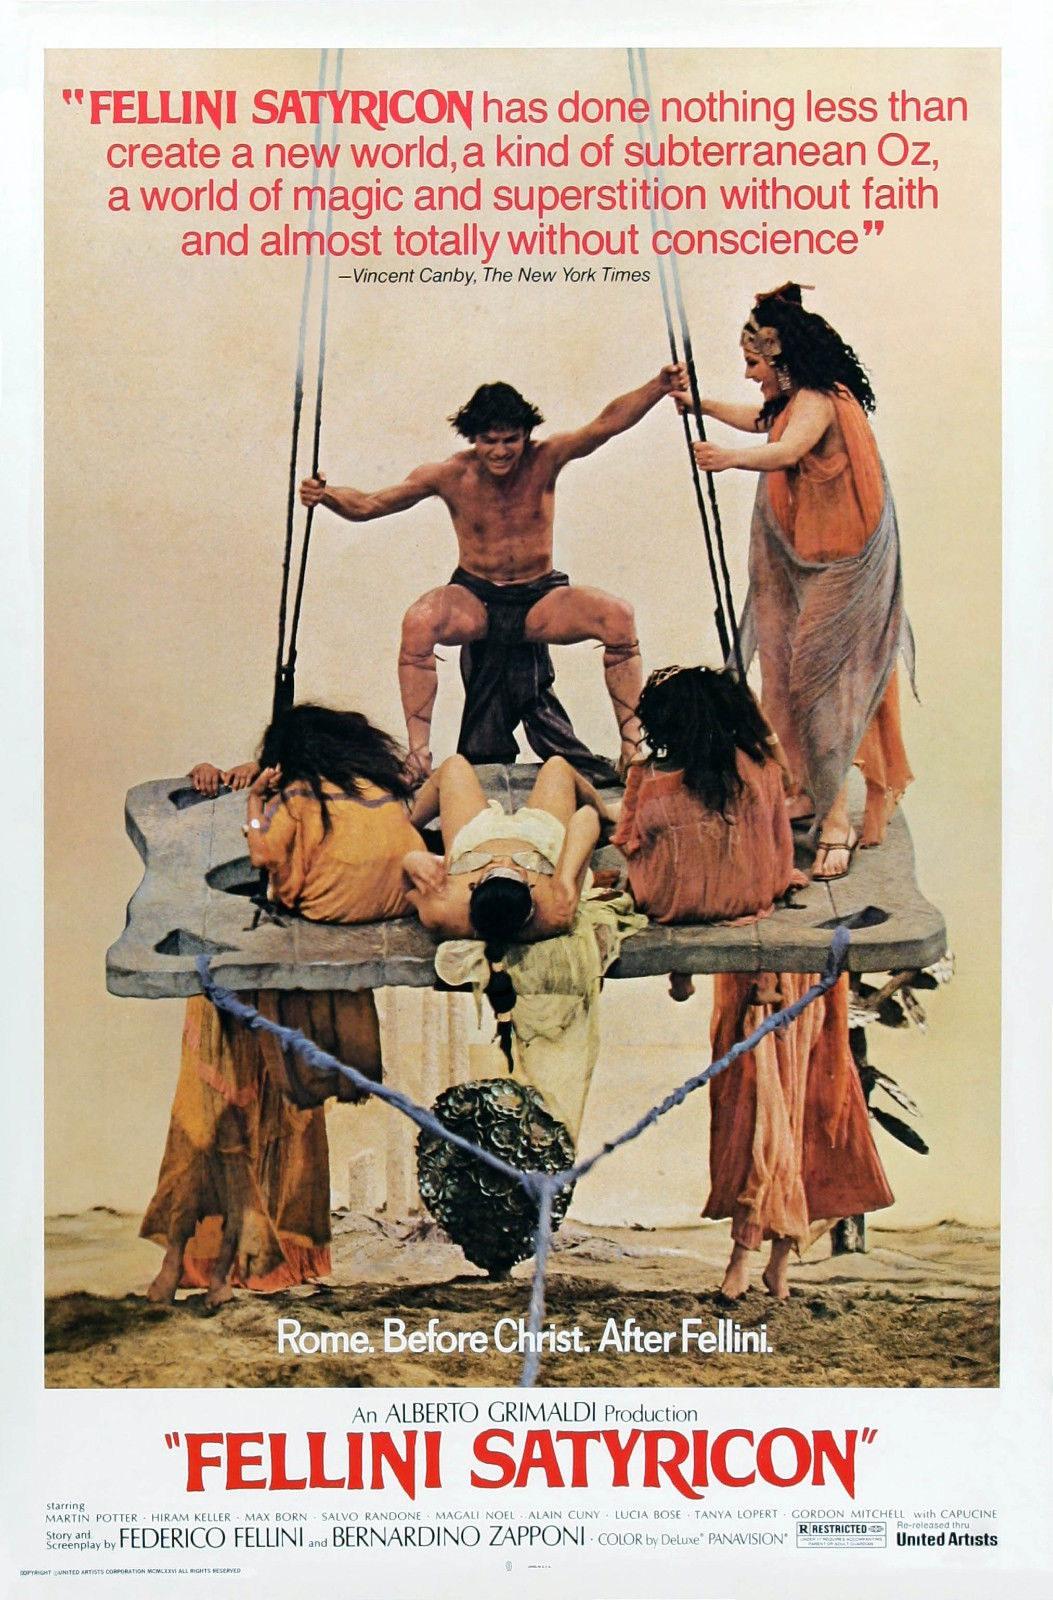 73032-Fellini-Satyricon-034-Fellini-Satyricon-034-Movie-Wall-Print-Poster-Affiche